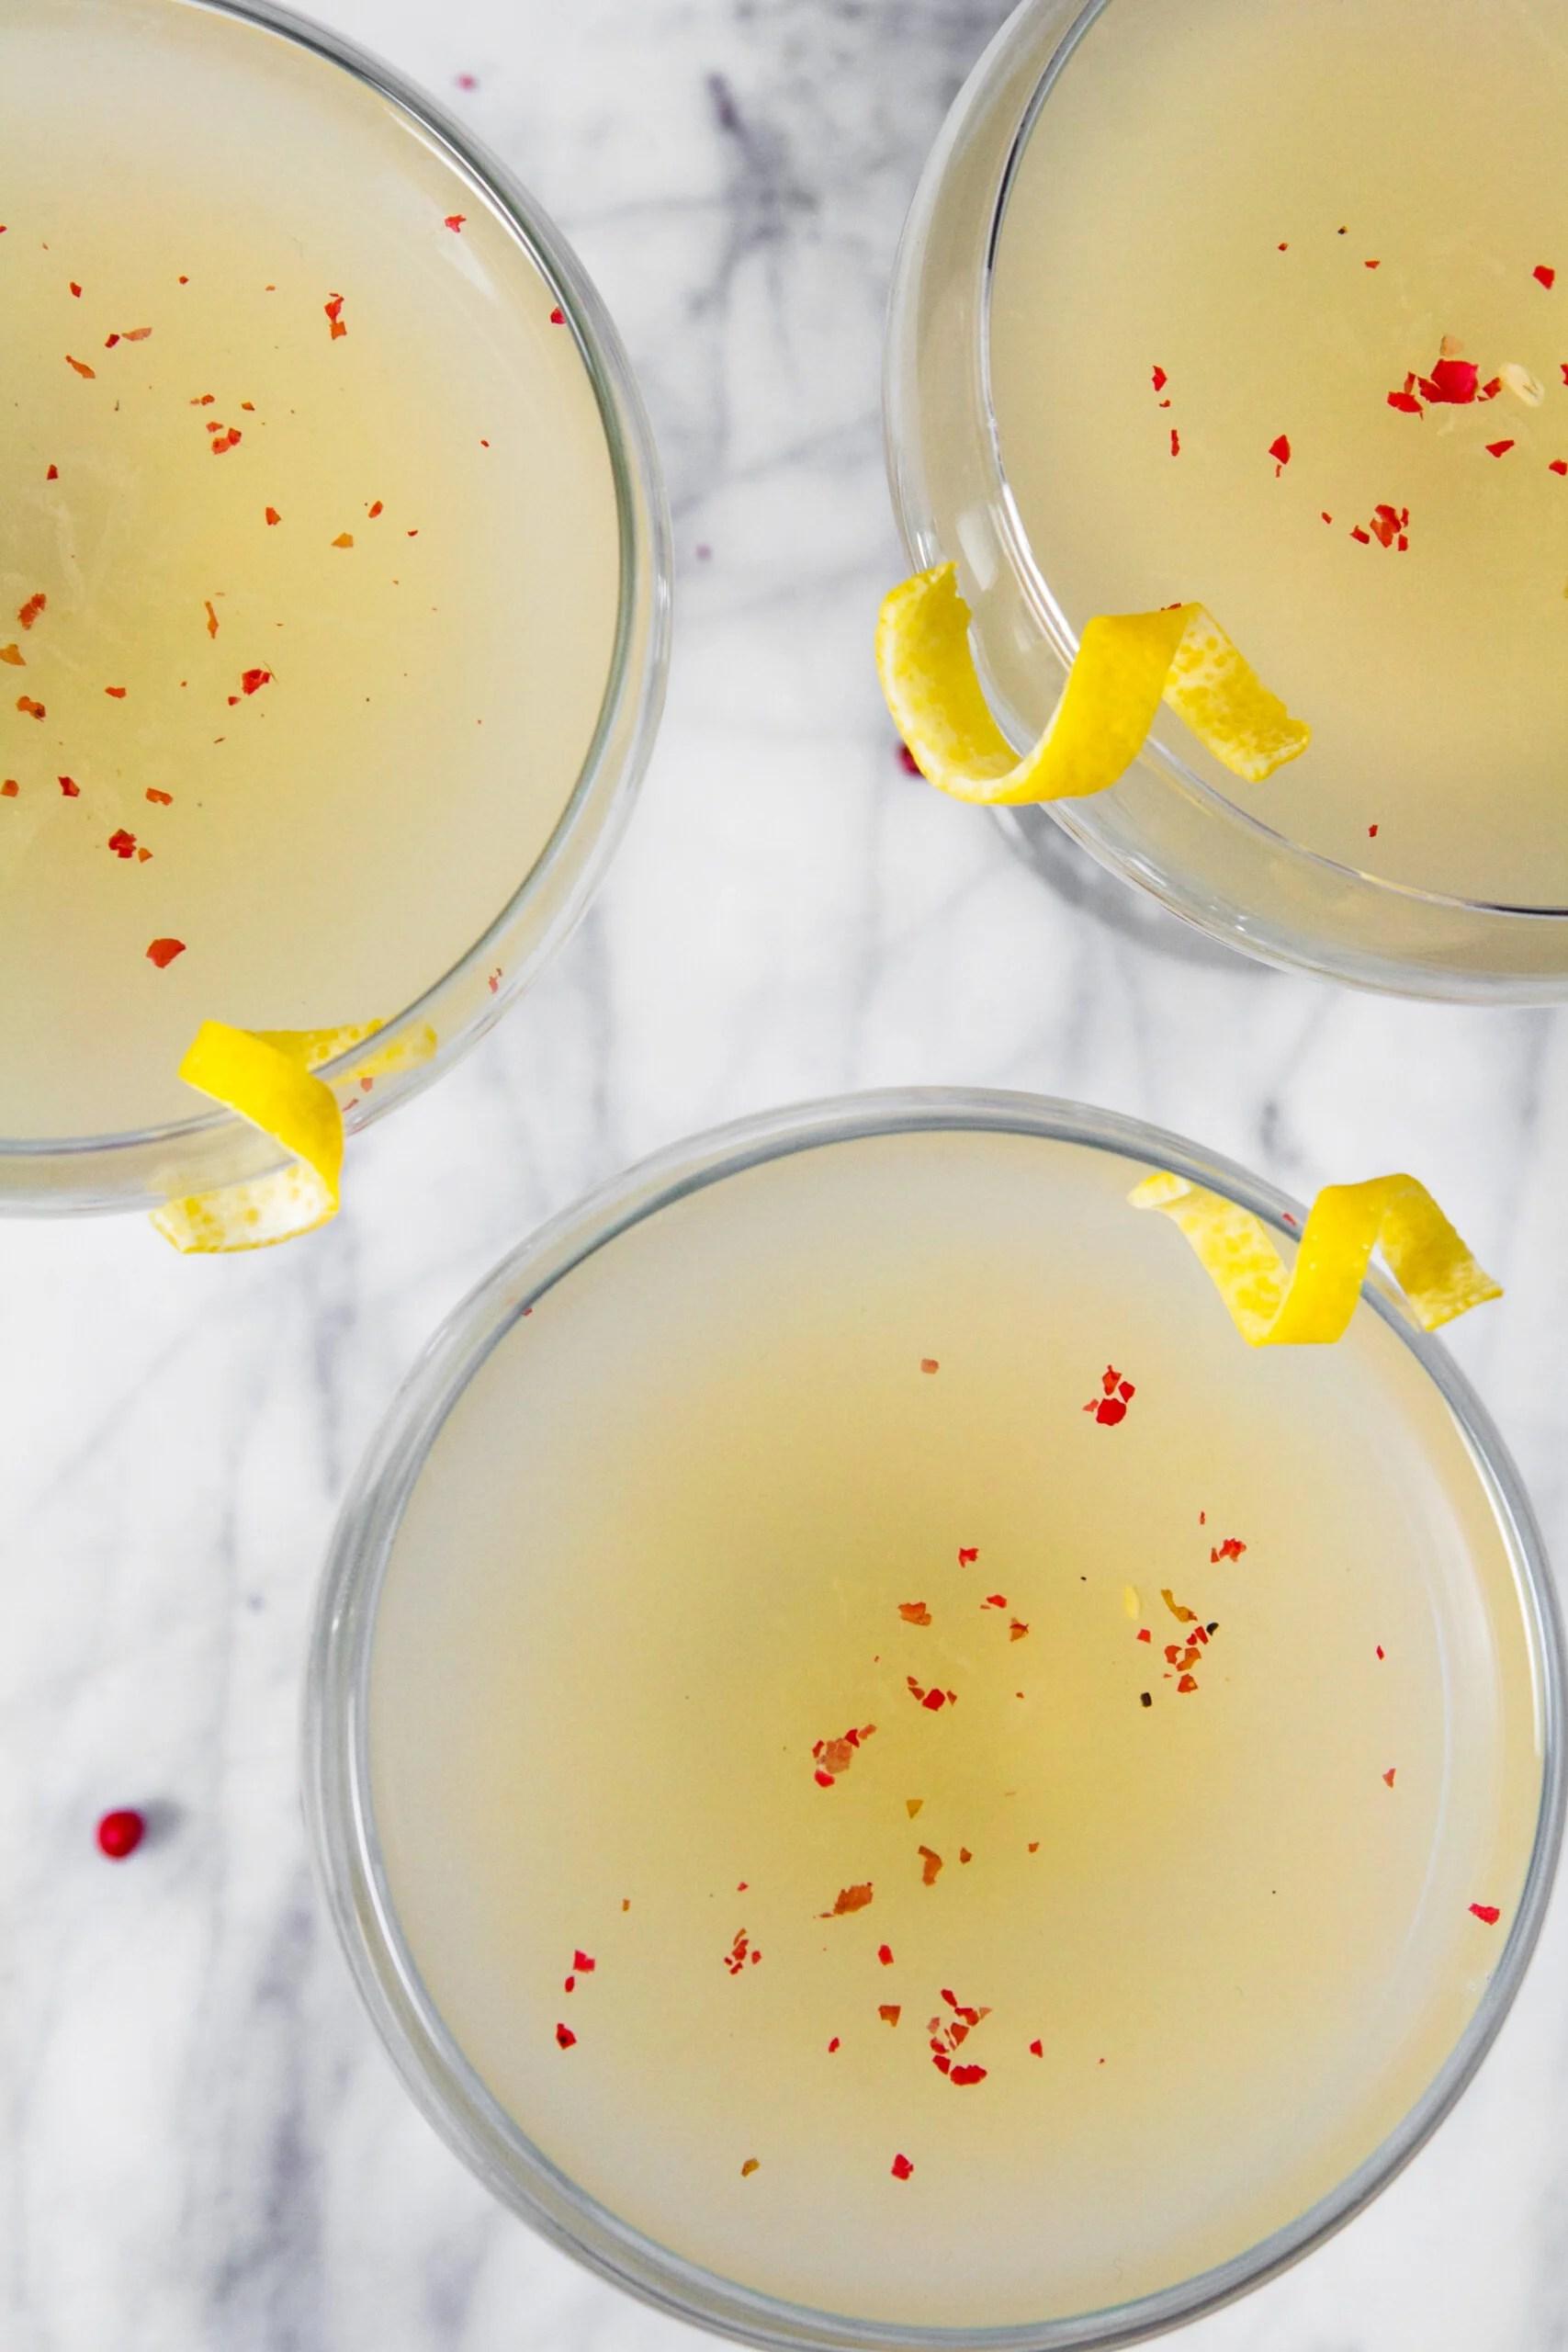 Vodka-Kombucha Cocktail with Cardamom | Zestful Kitchen